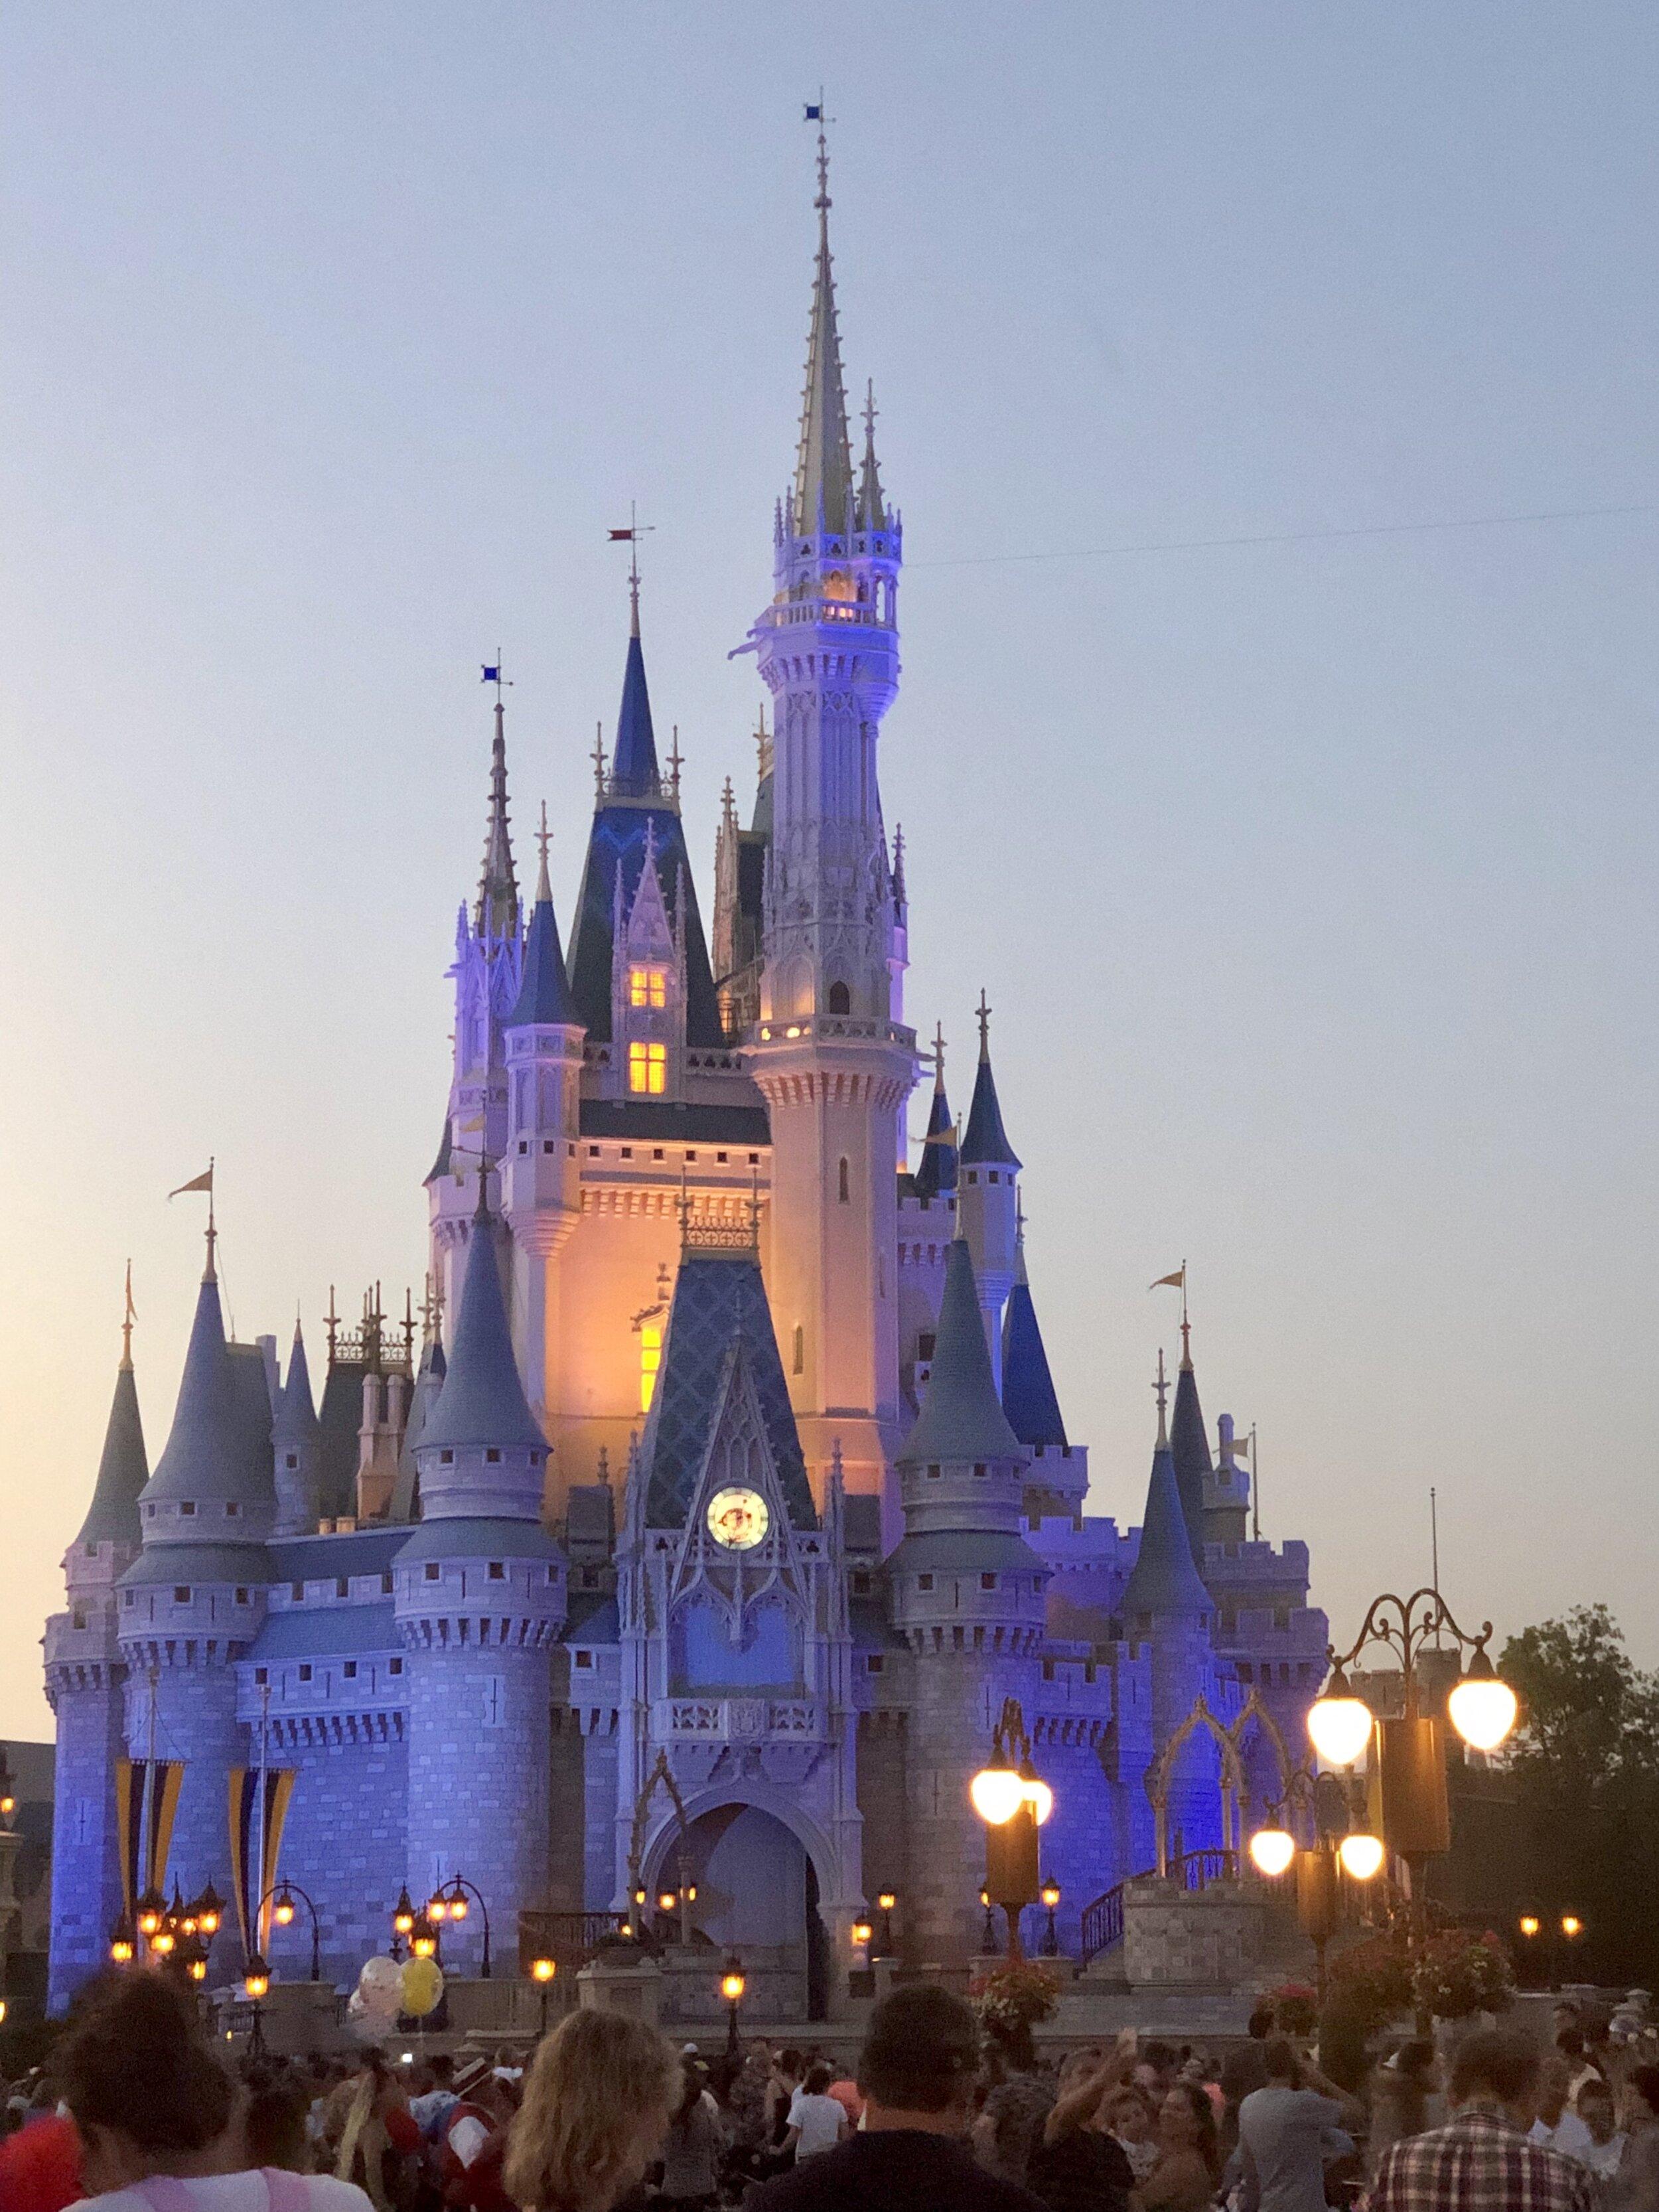 Cinderella's castle lit up at twilight in Magic Kingdom Disney World.